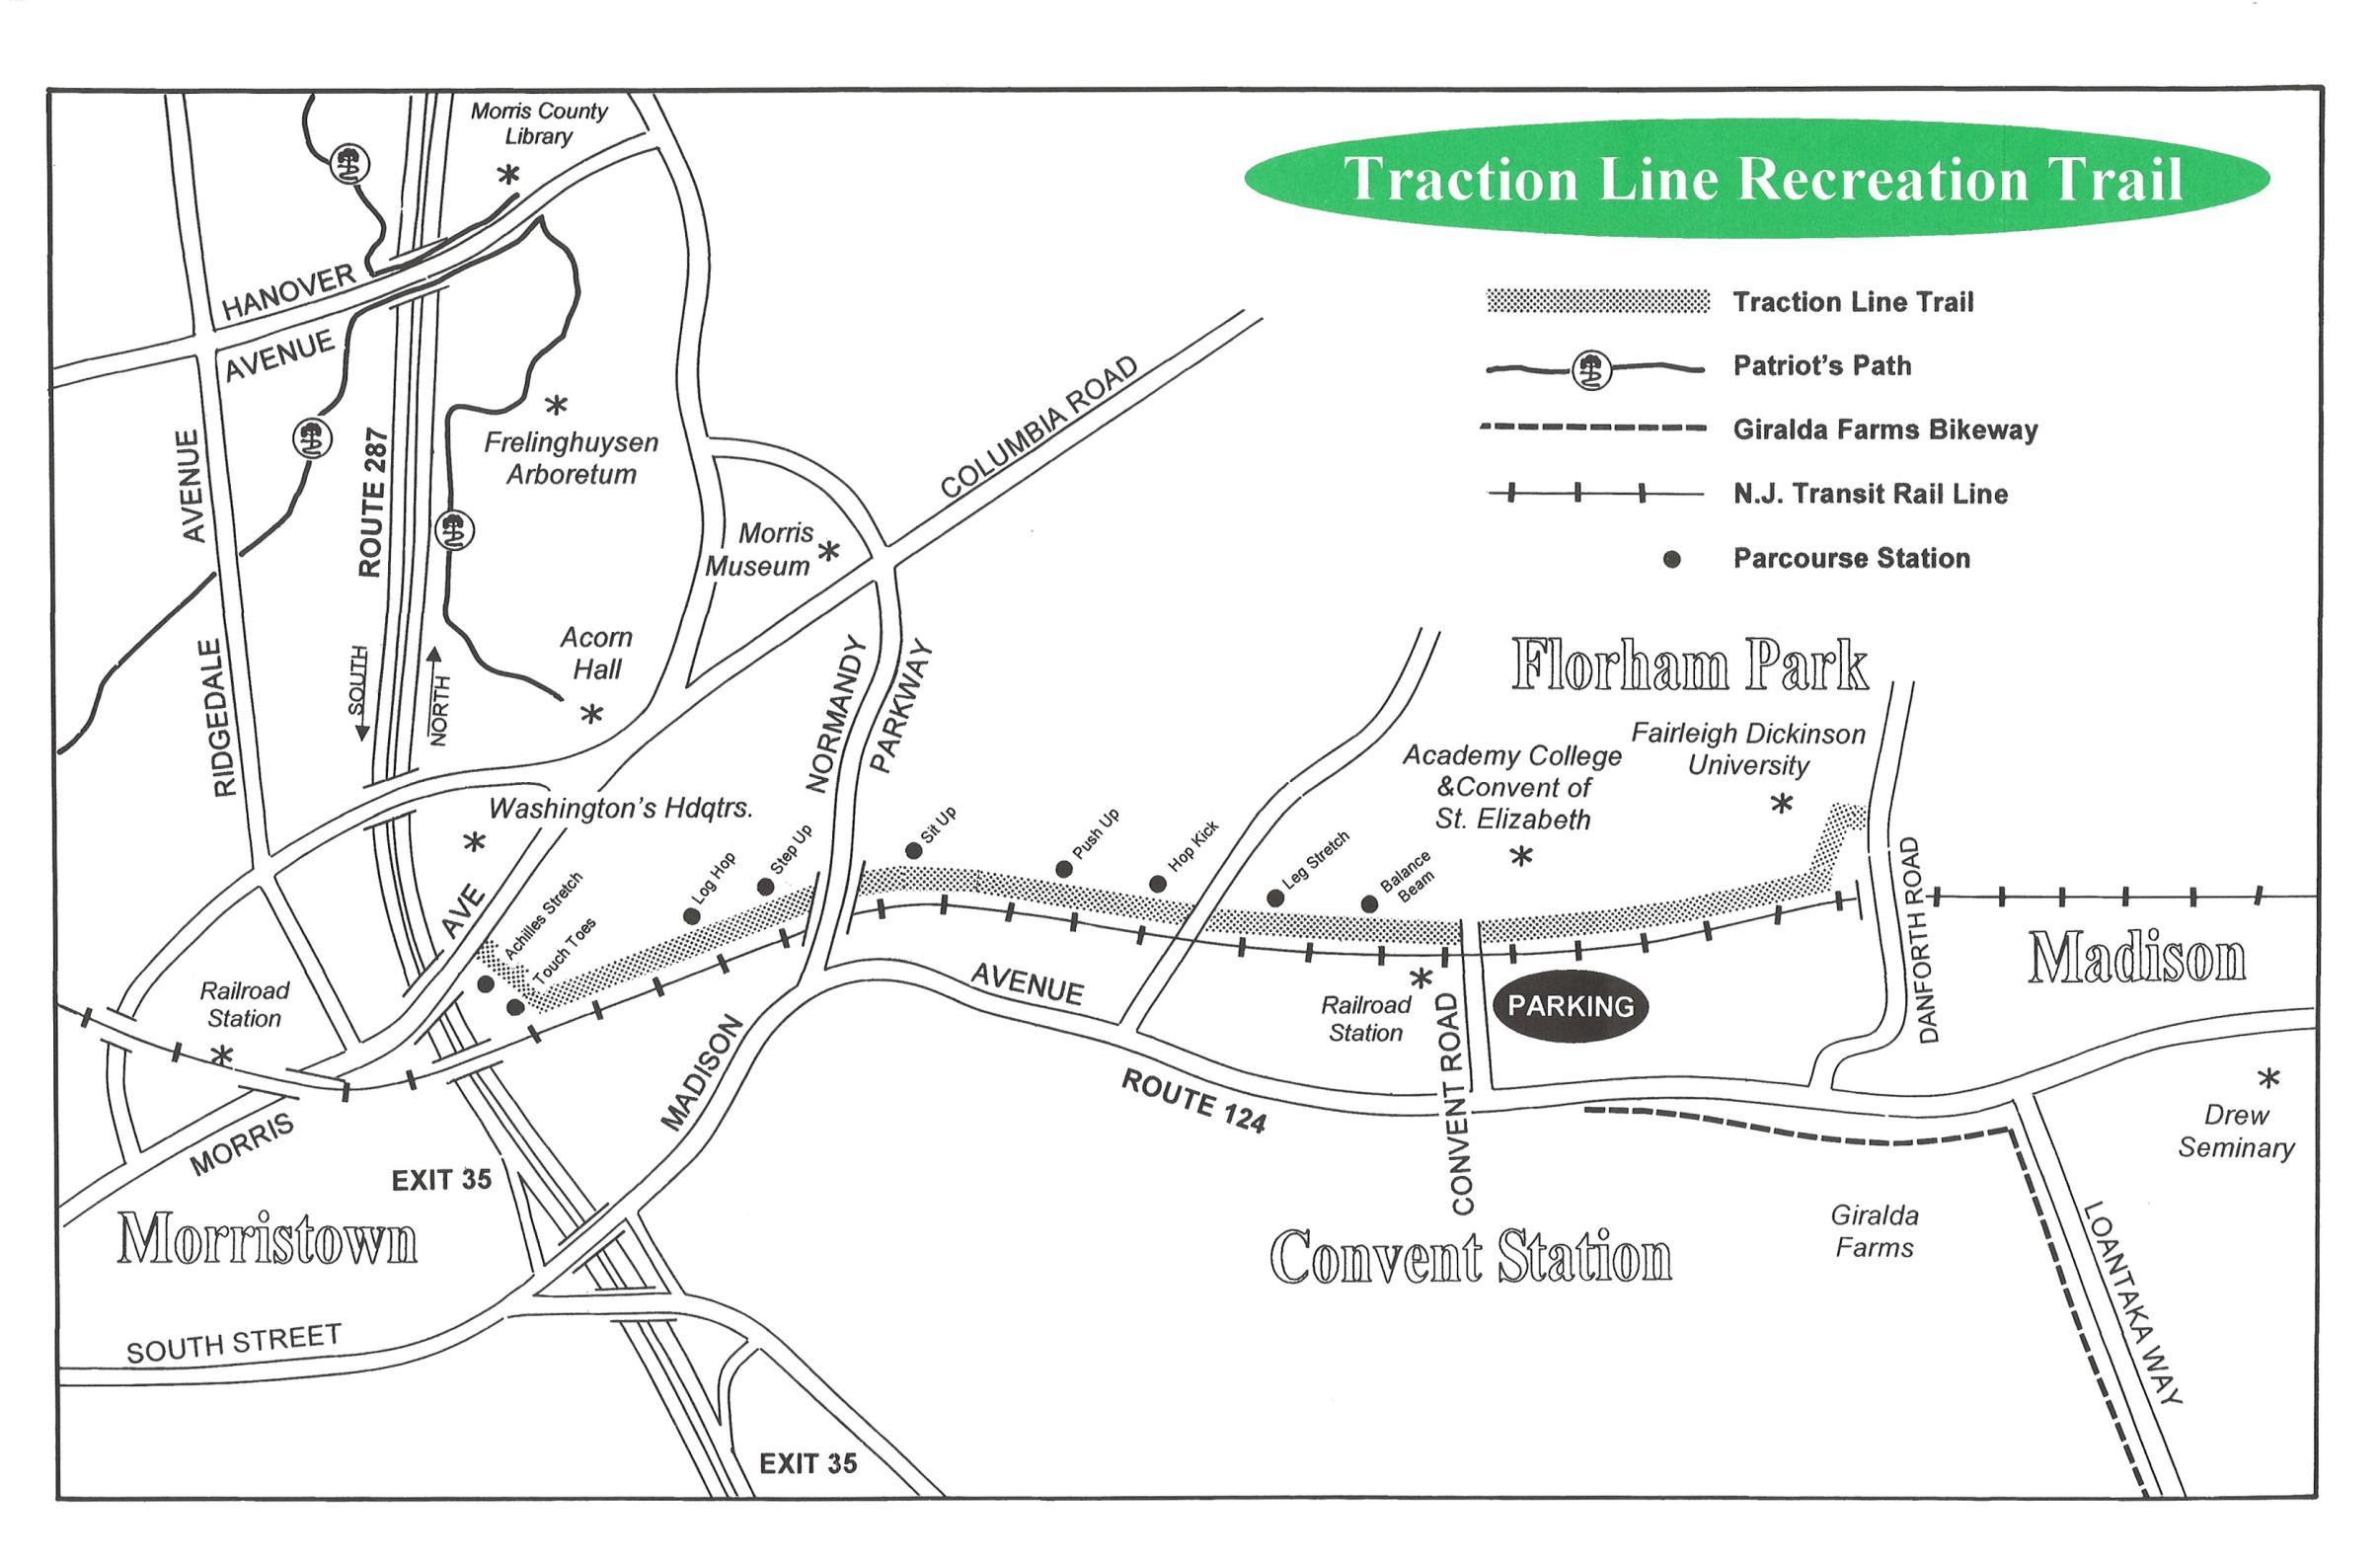 morris township new providence daily photo Loantaka Park Trail Map traction line map, via morrisparks net loantaka park trail map